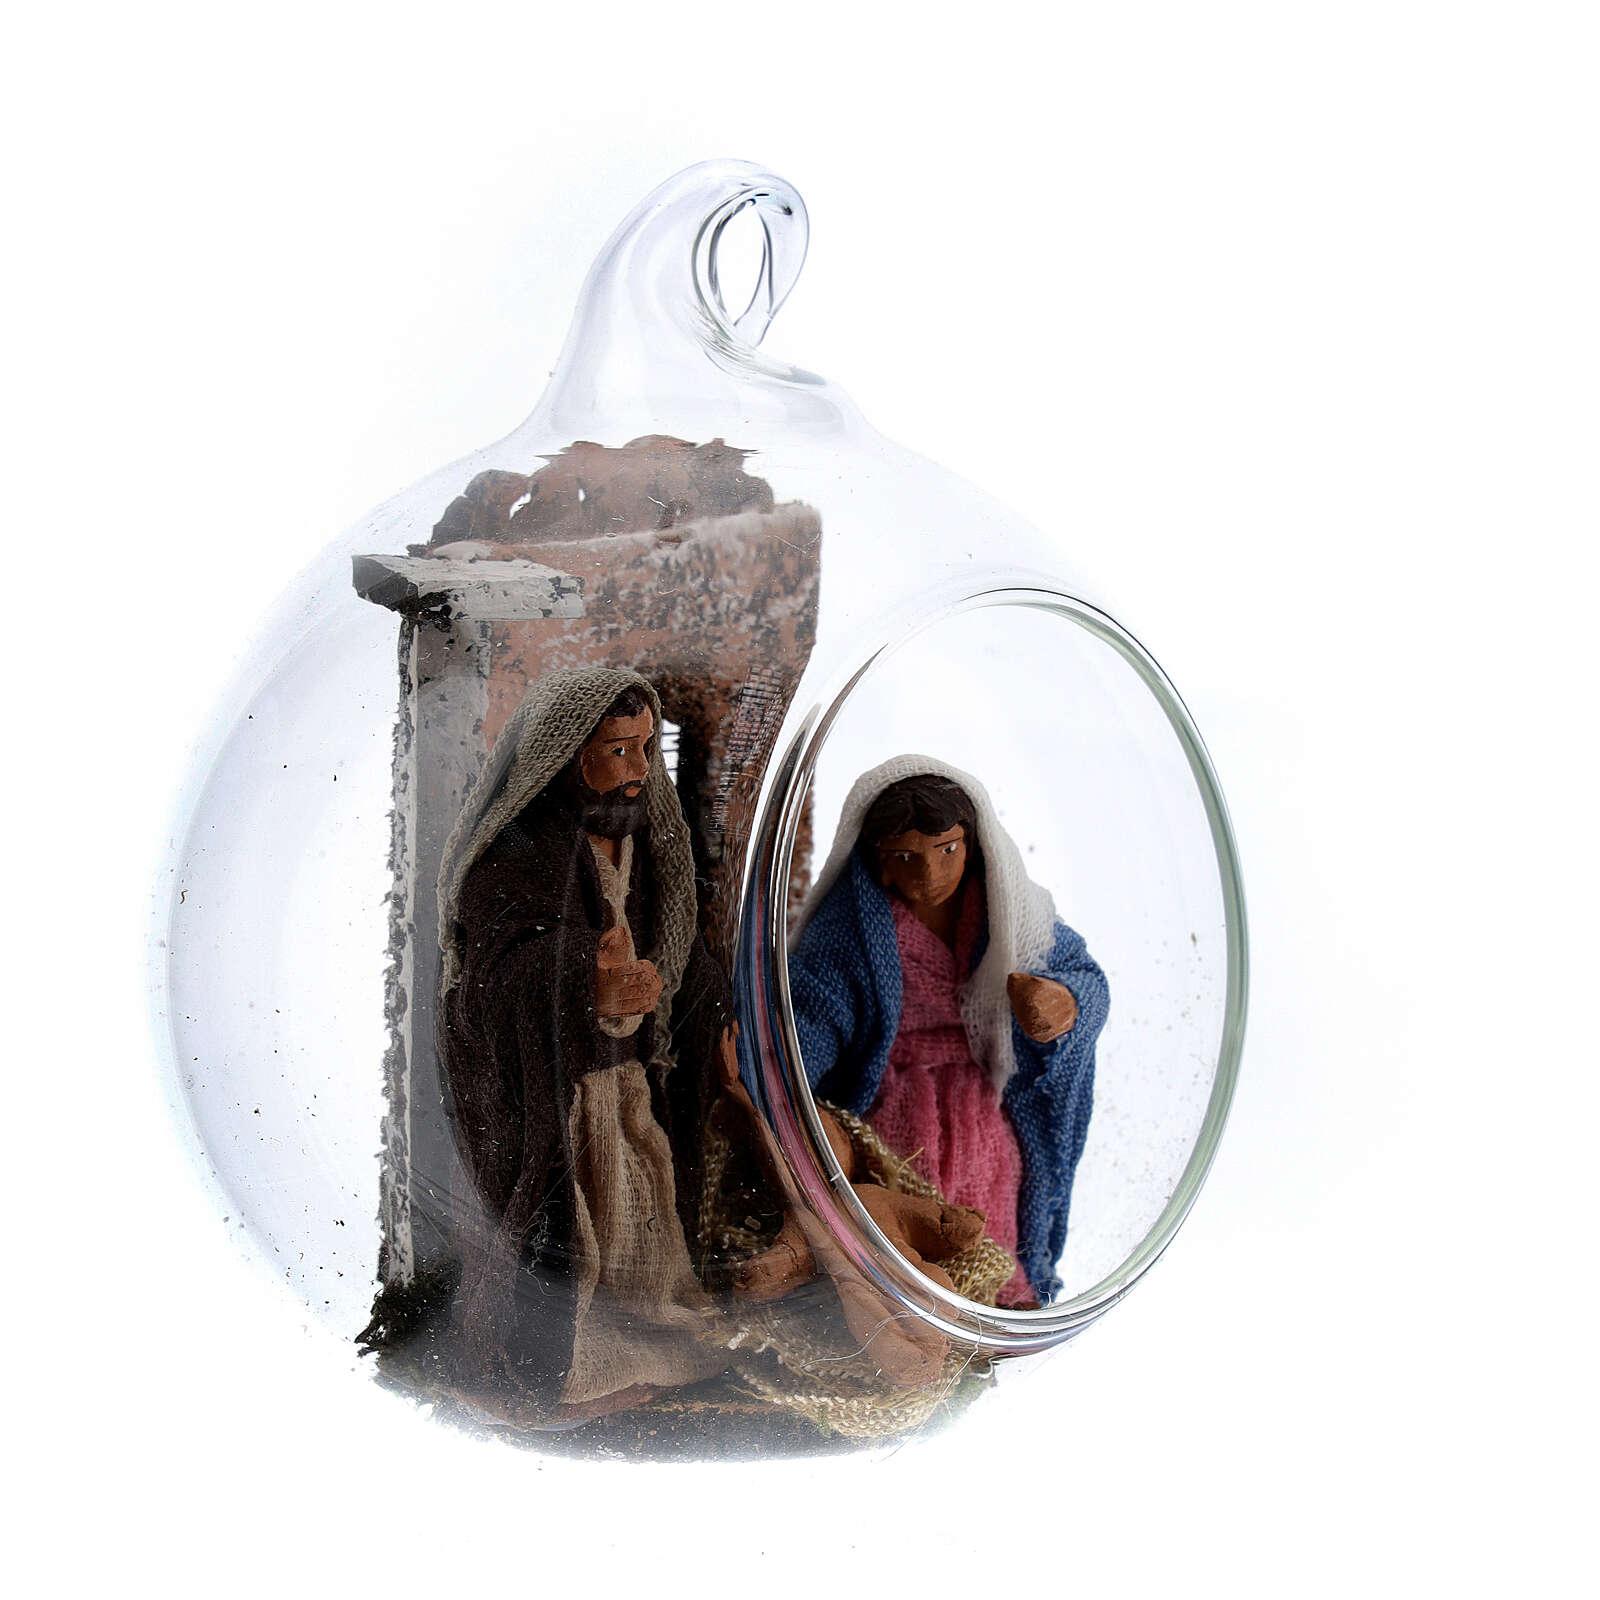 Holy Family set in glass 6 cm Neapolitan nativity 4